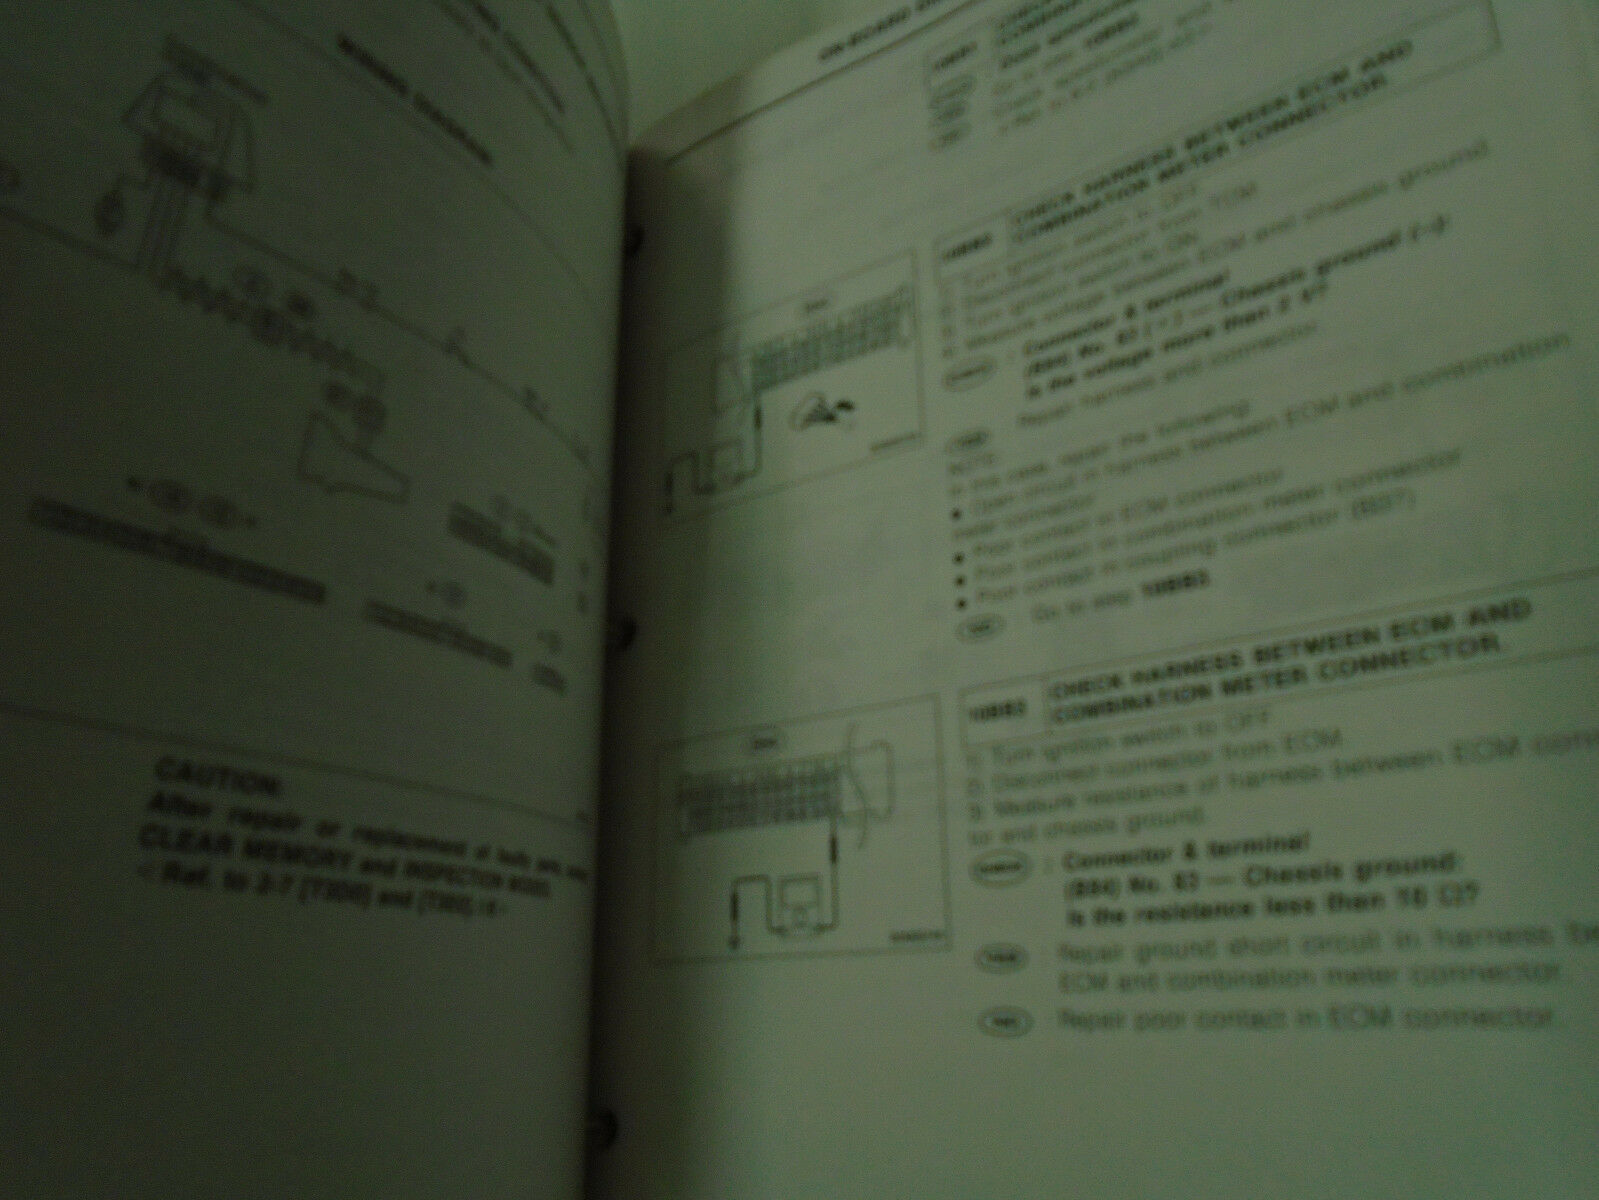 1997 Subaru Legacy Service Manual Repair Shop Set Factory FEO BOOKS Used ***